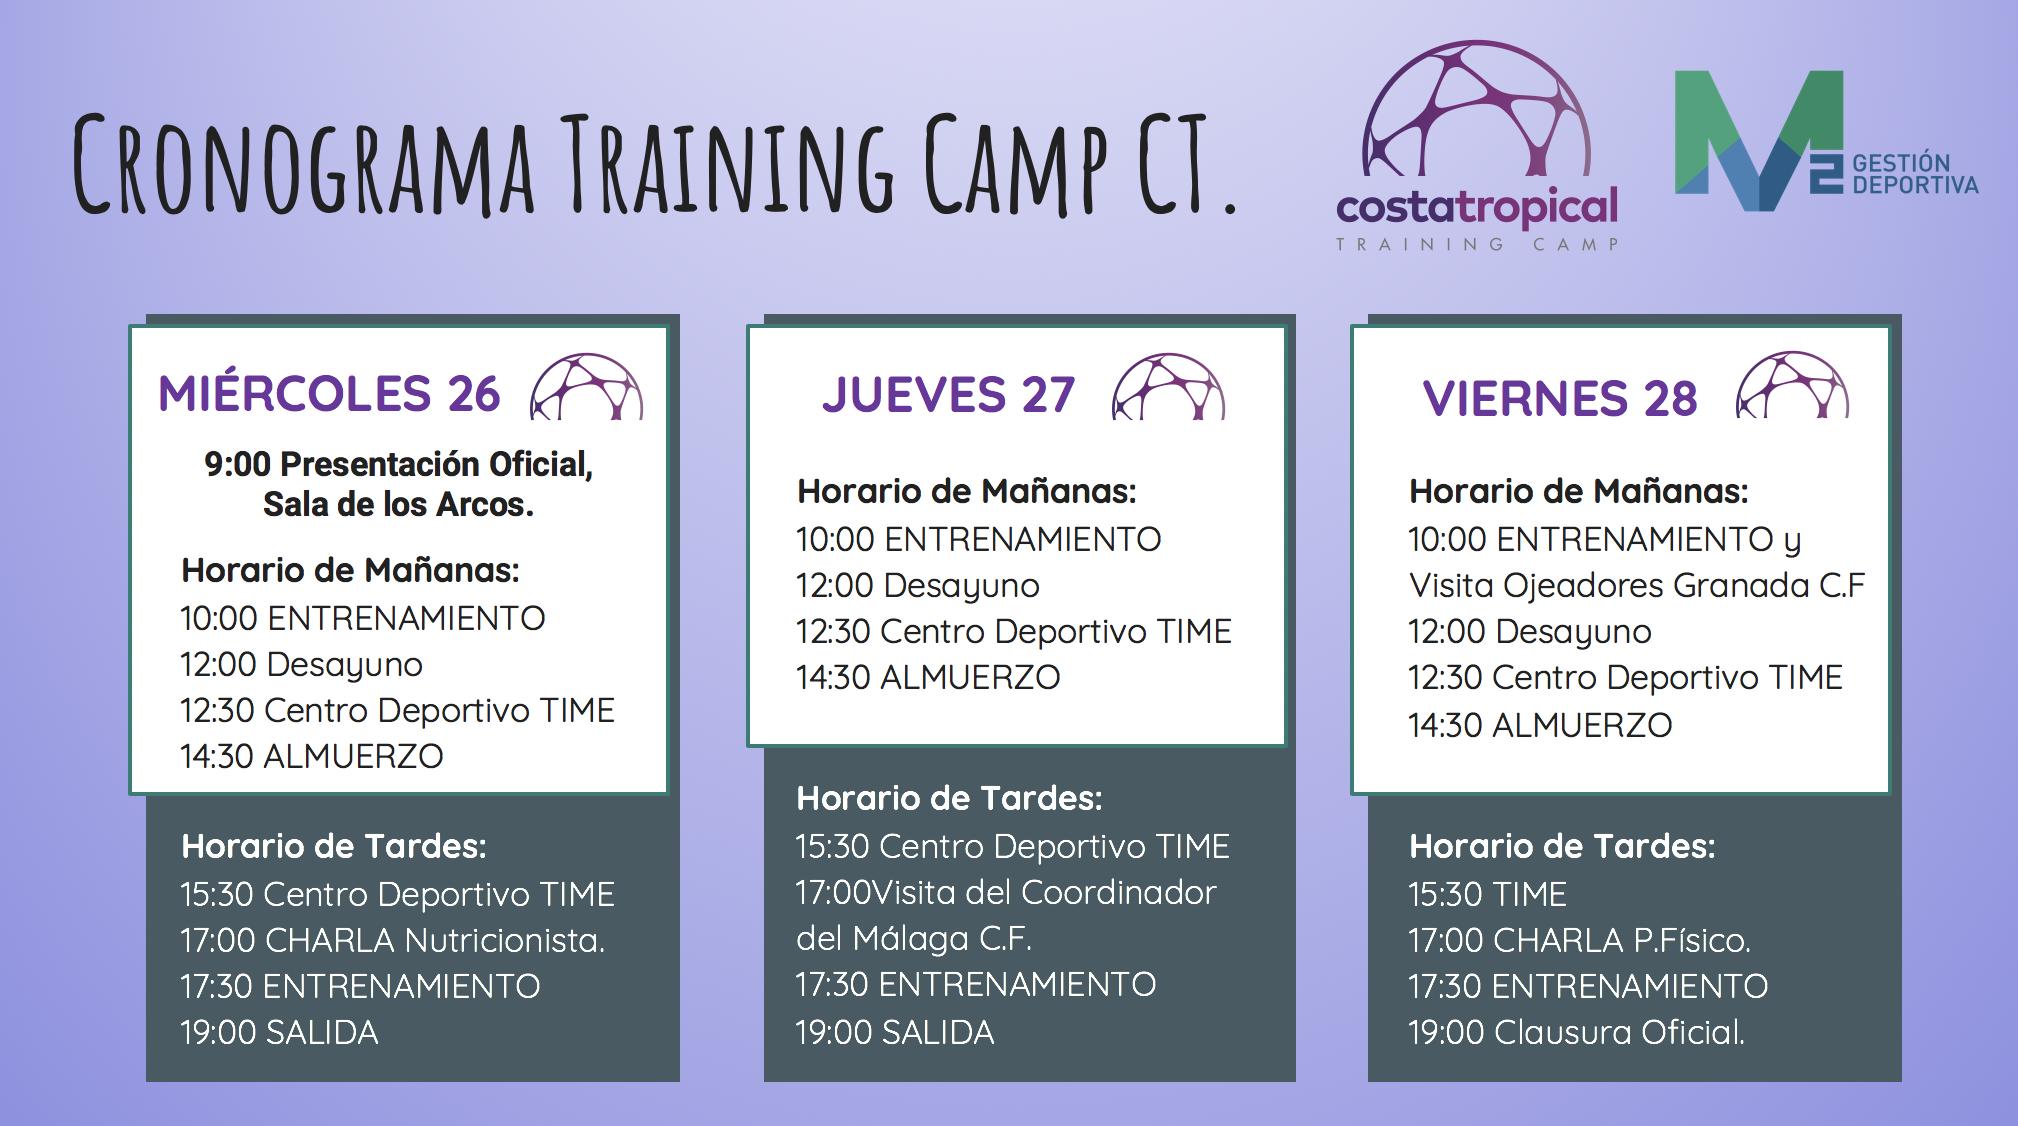 Cronograma Training Camp CT